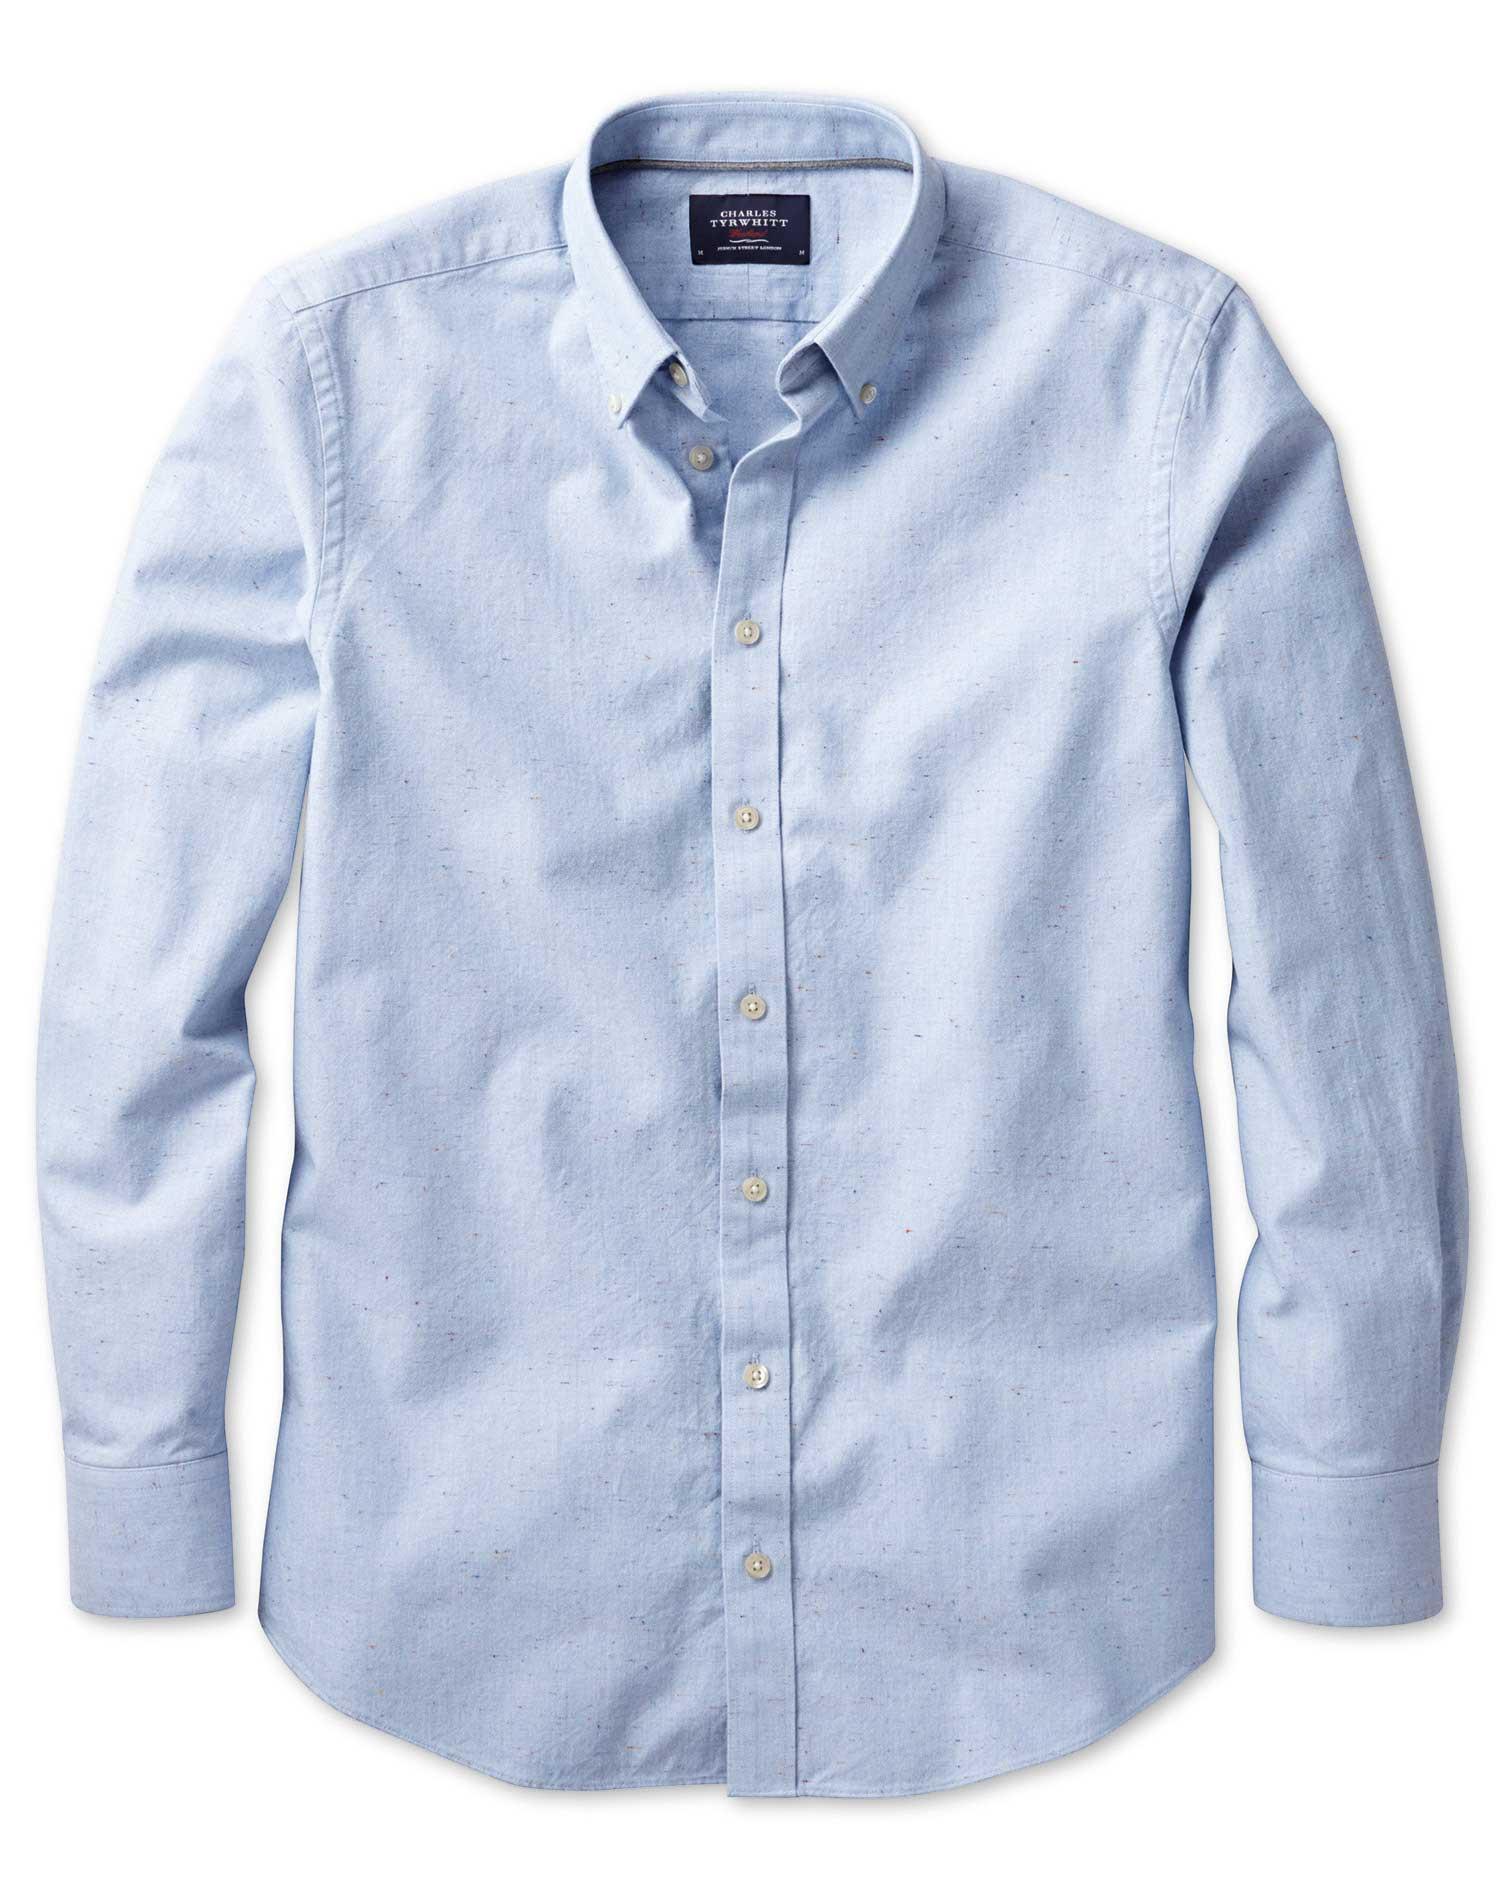 Classic Fit Modern Oxford Sky Blue Fleck Cotton Shirt Single Cuff Size Large by Charles Tyrwhitt